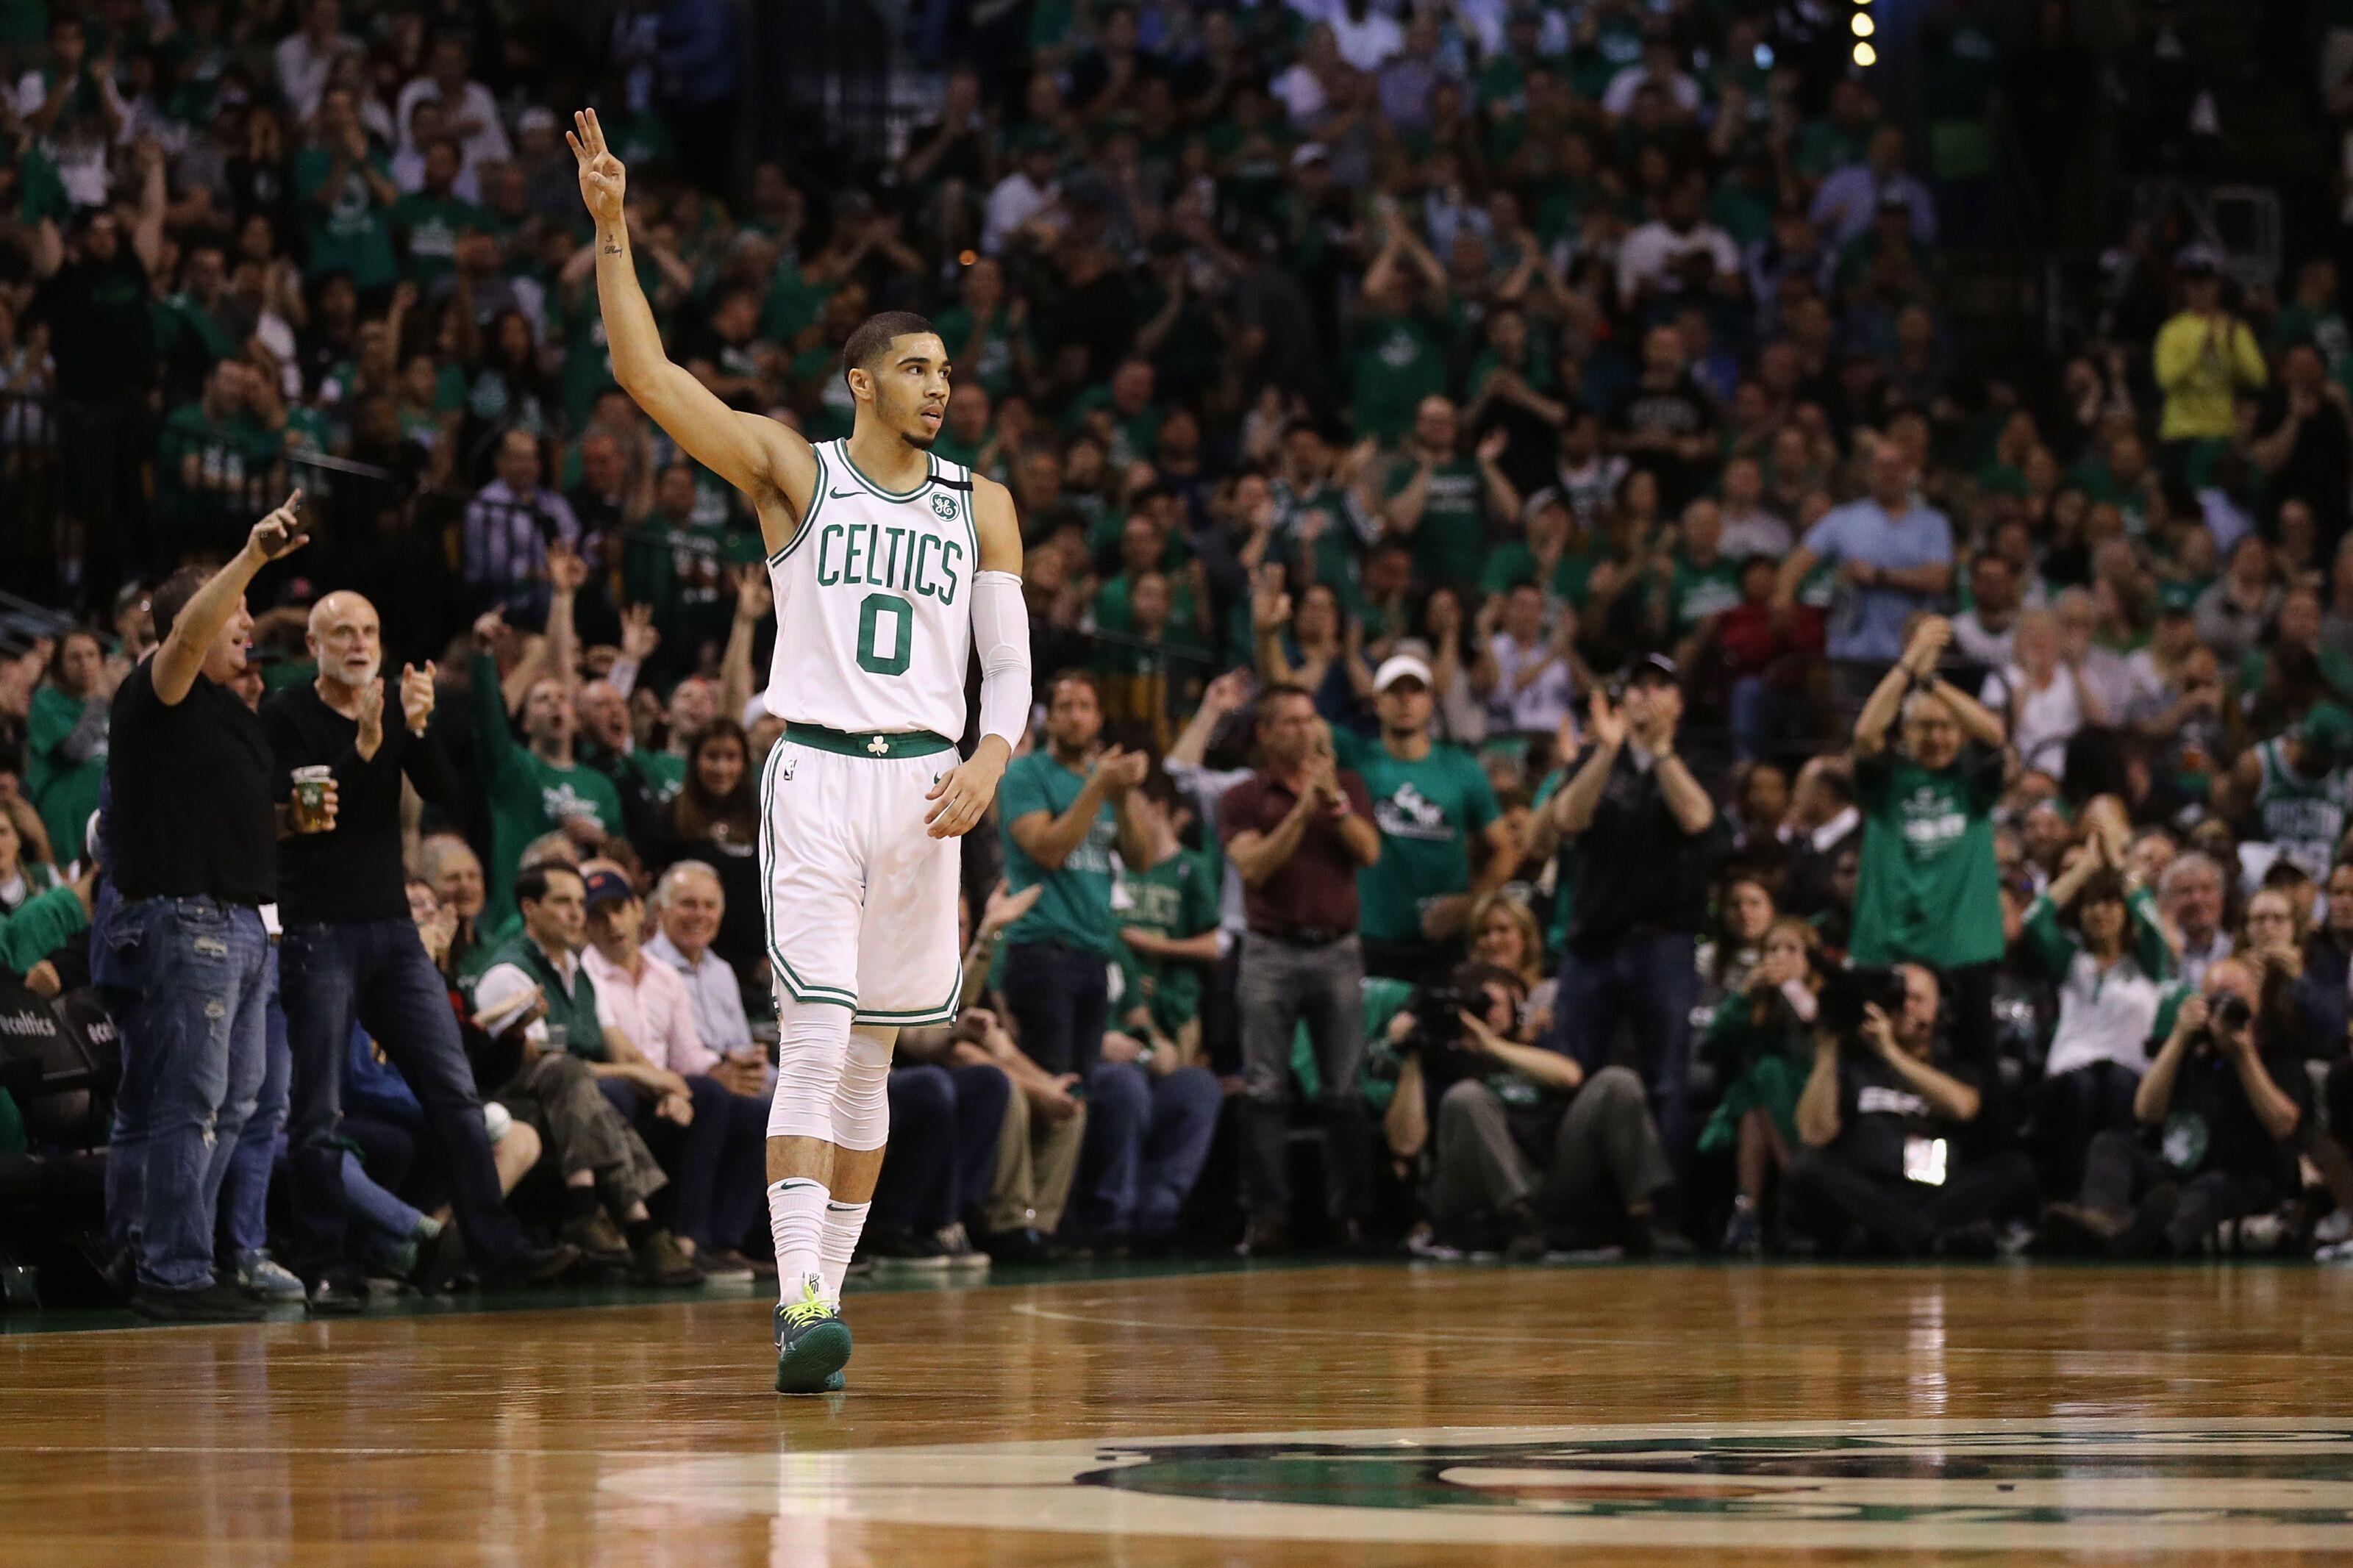 Boston Ma May  Jayson Tatum  Of The Boston Celtics Gestures